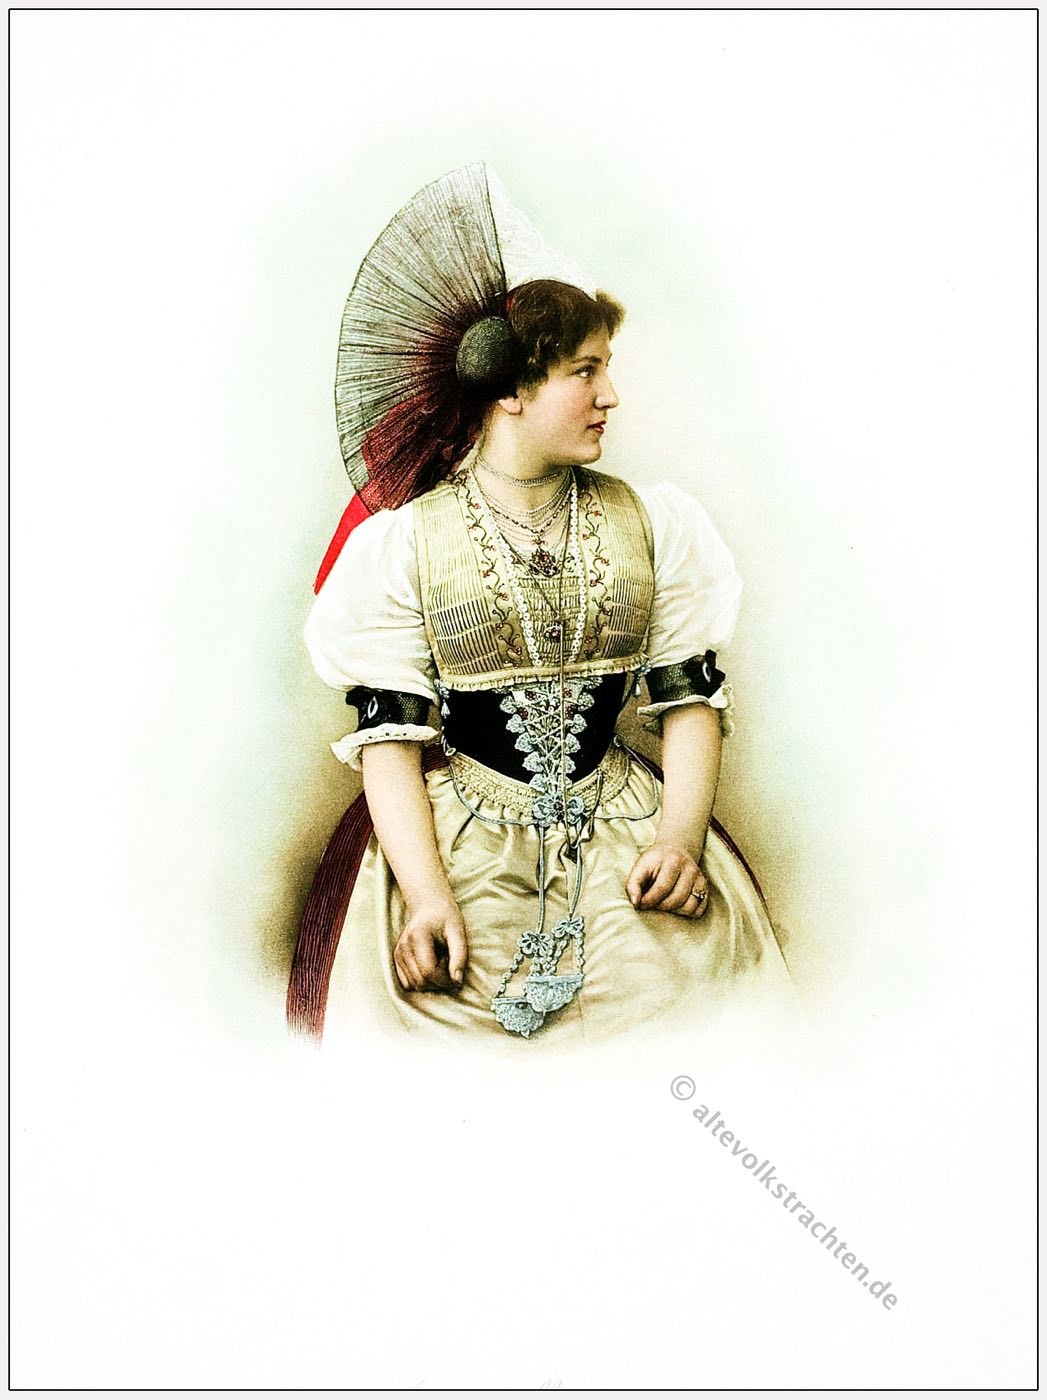 Innerrhoden, Trachten, Schweiz, Kostümgeschichte